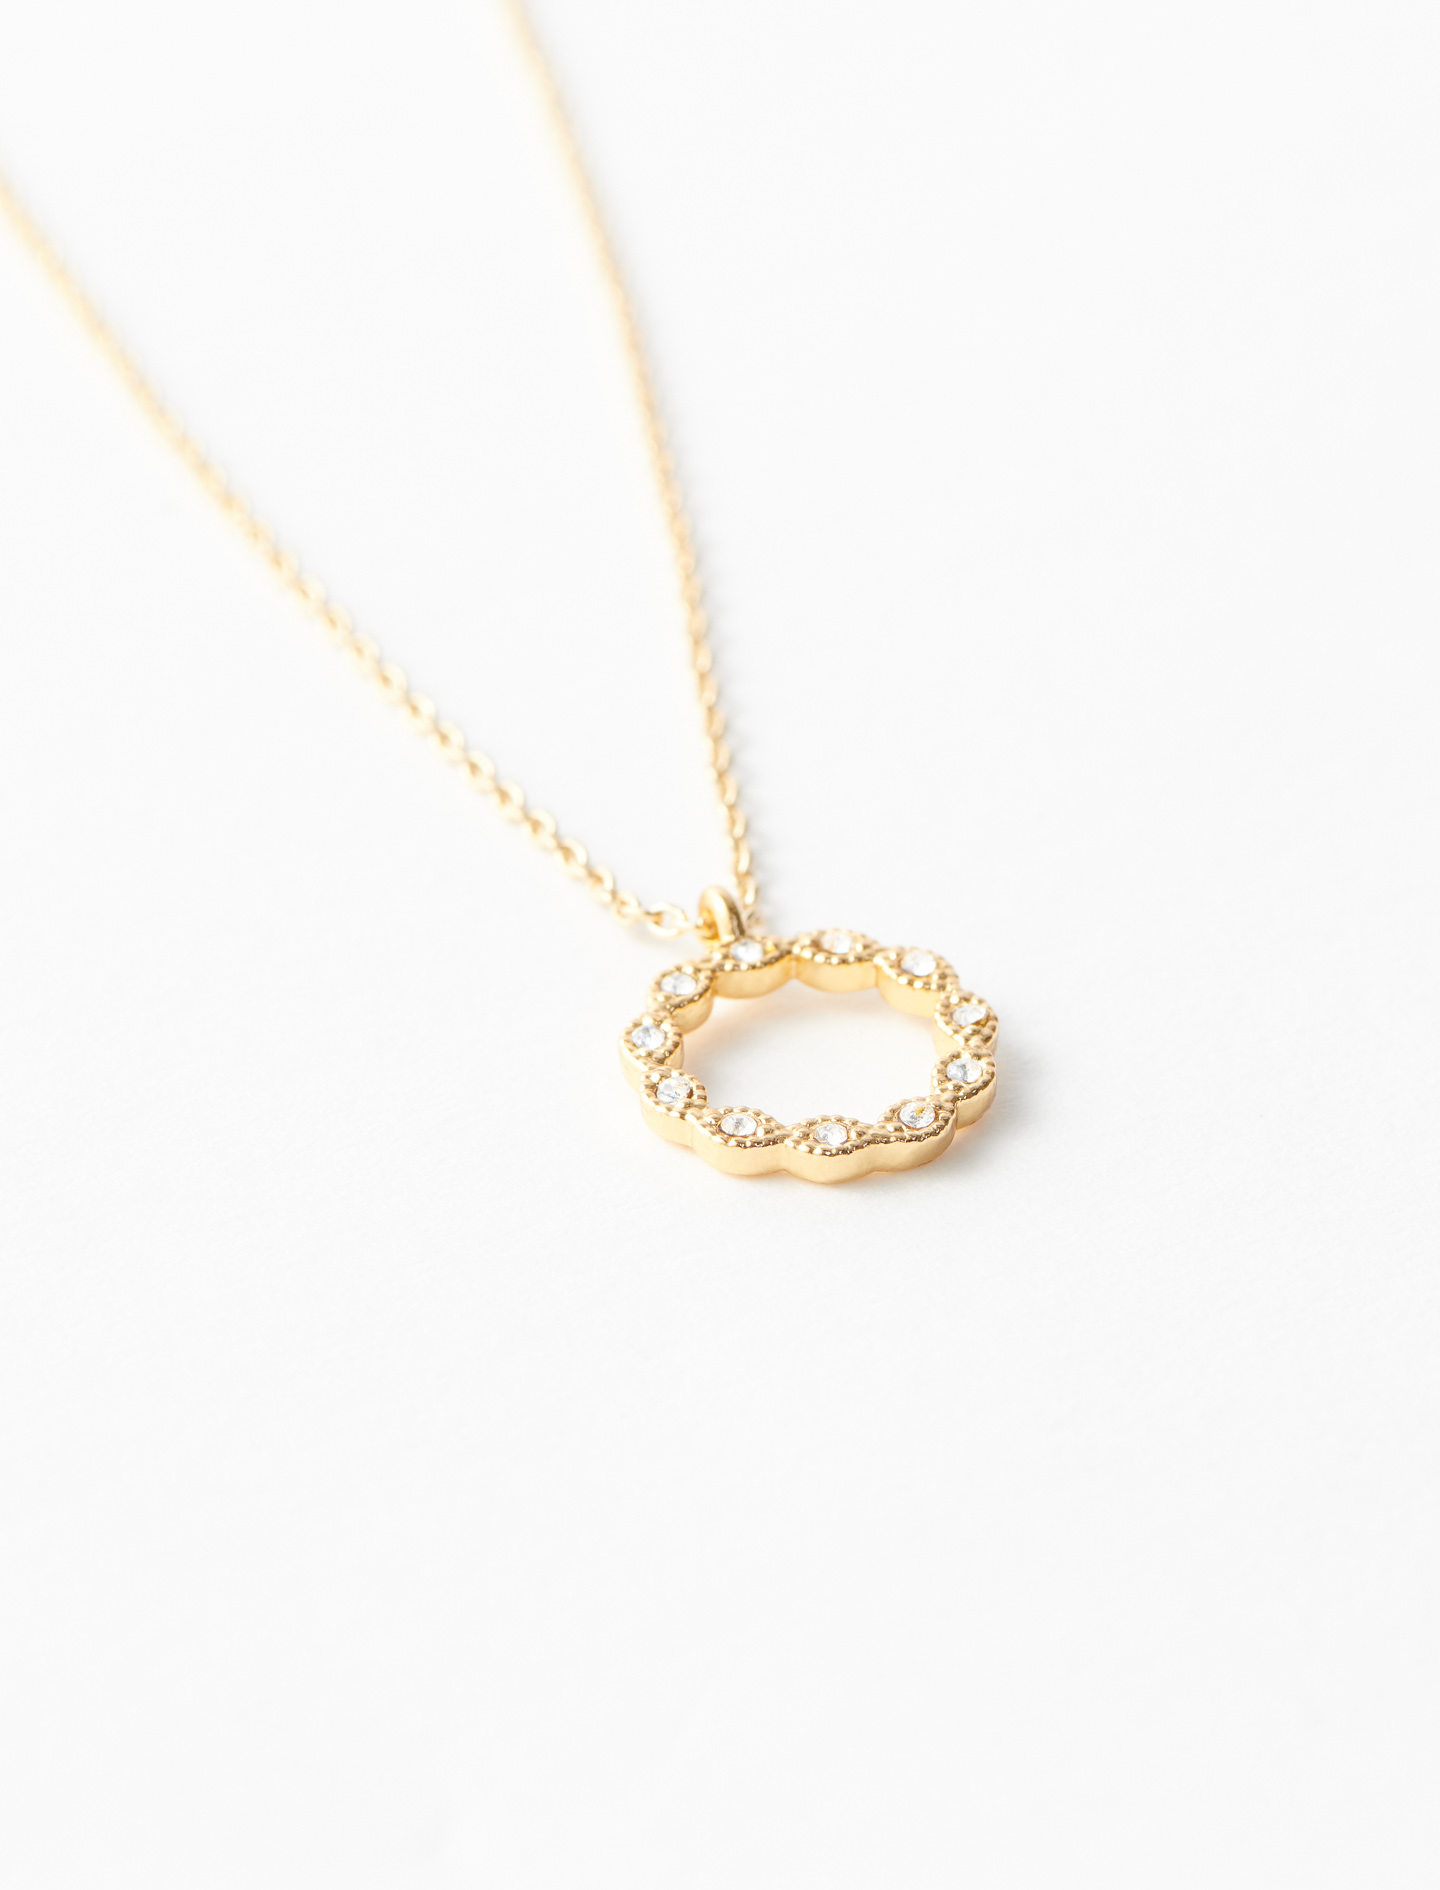 Rhinestone O necklace - Gold